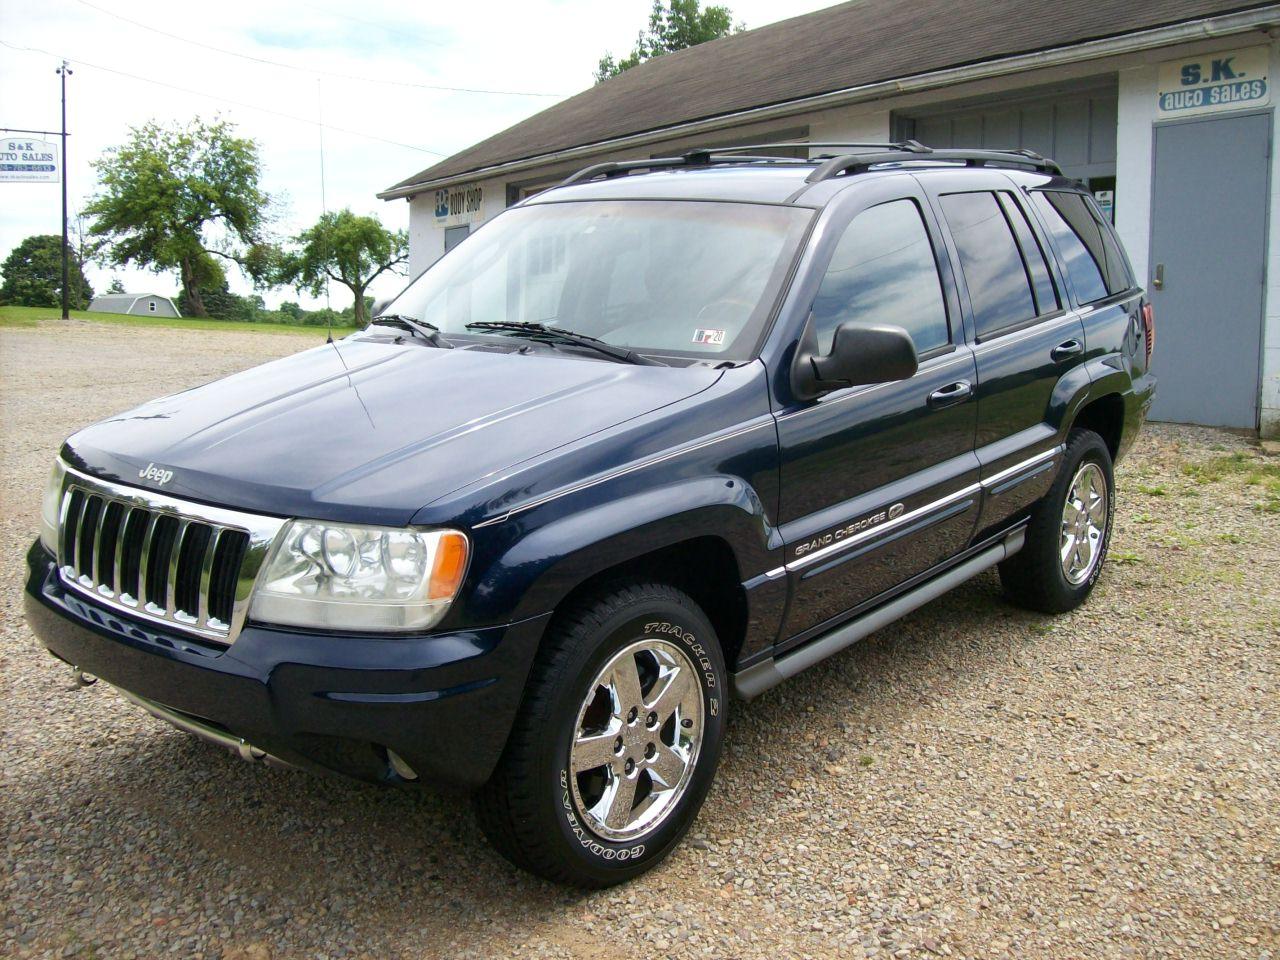 2004 Jeep Grand Cherokee Overland 4 7 High Output 4 4 114k S K Auto Sales